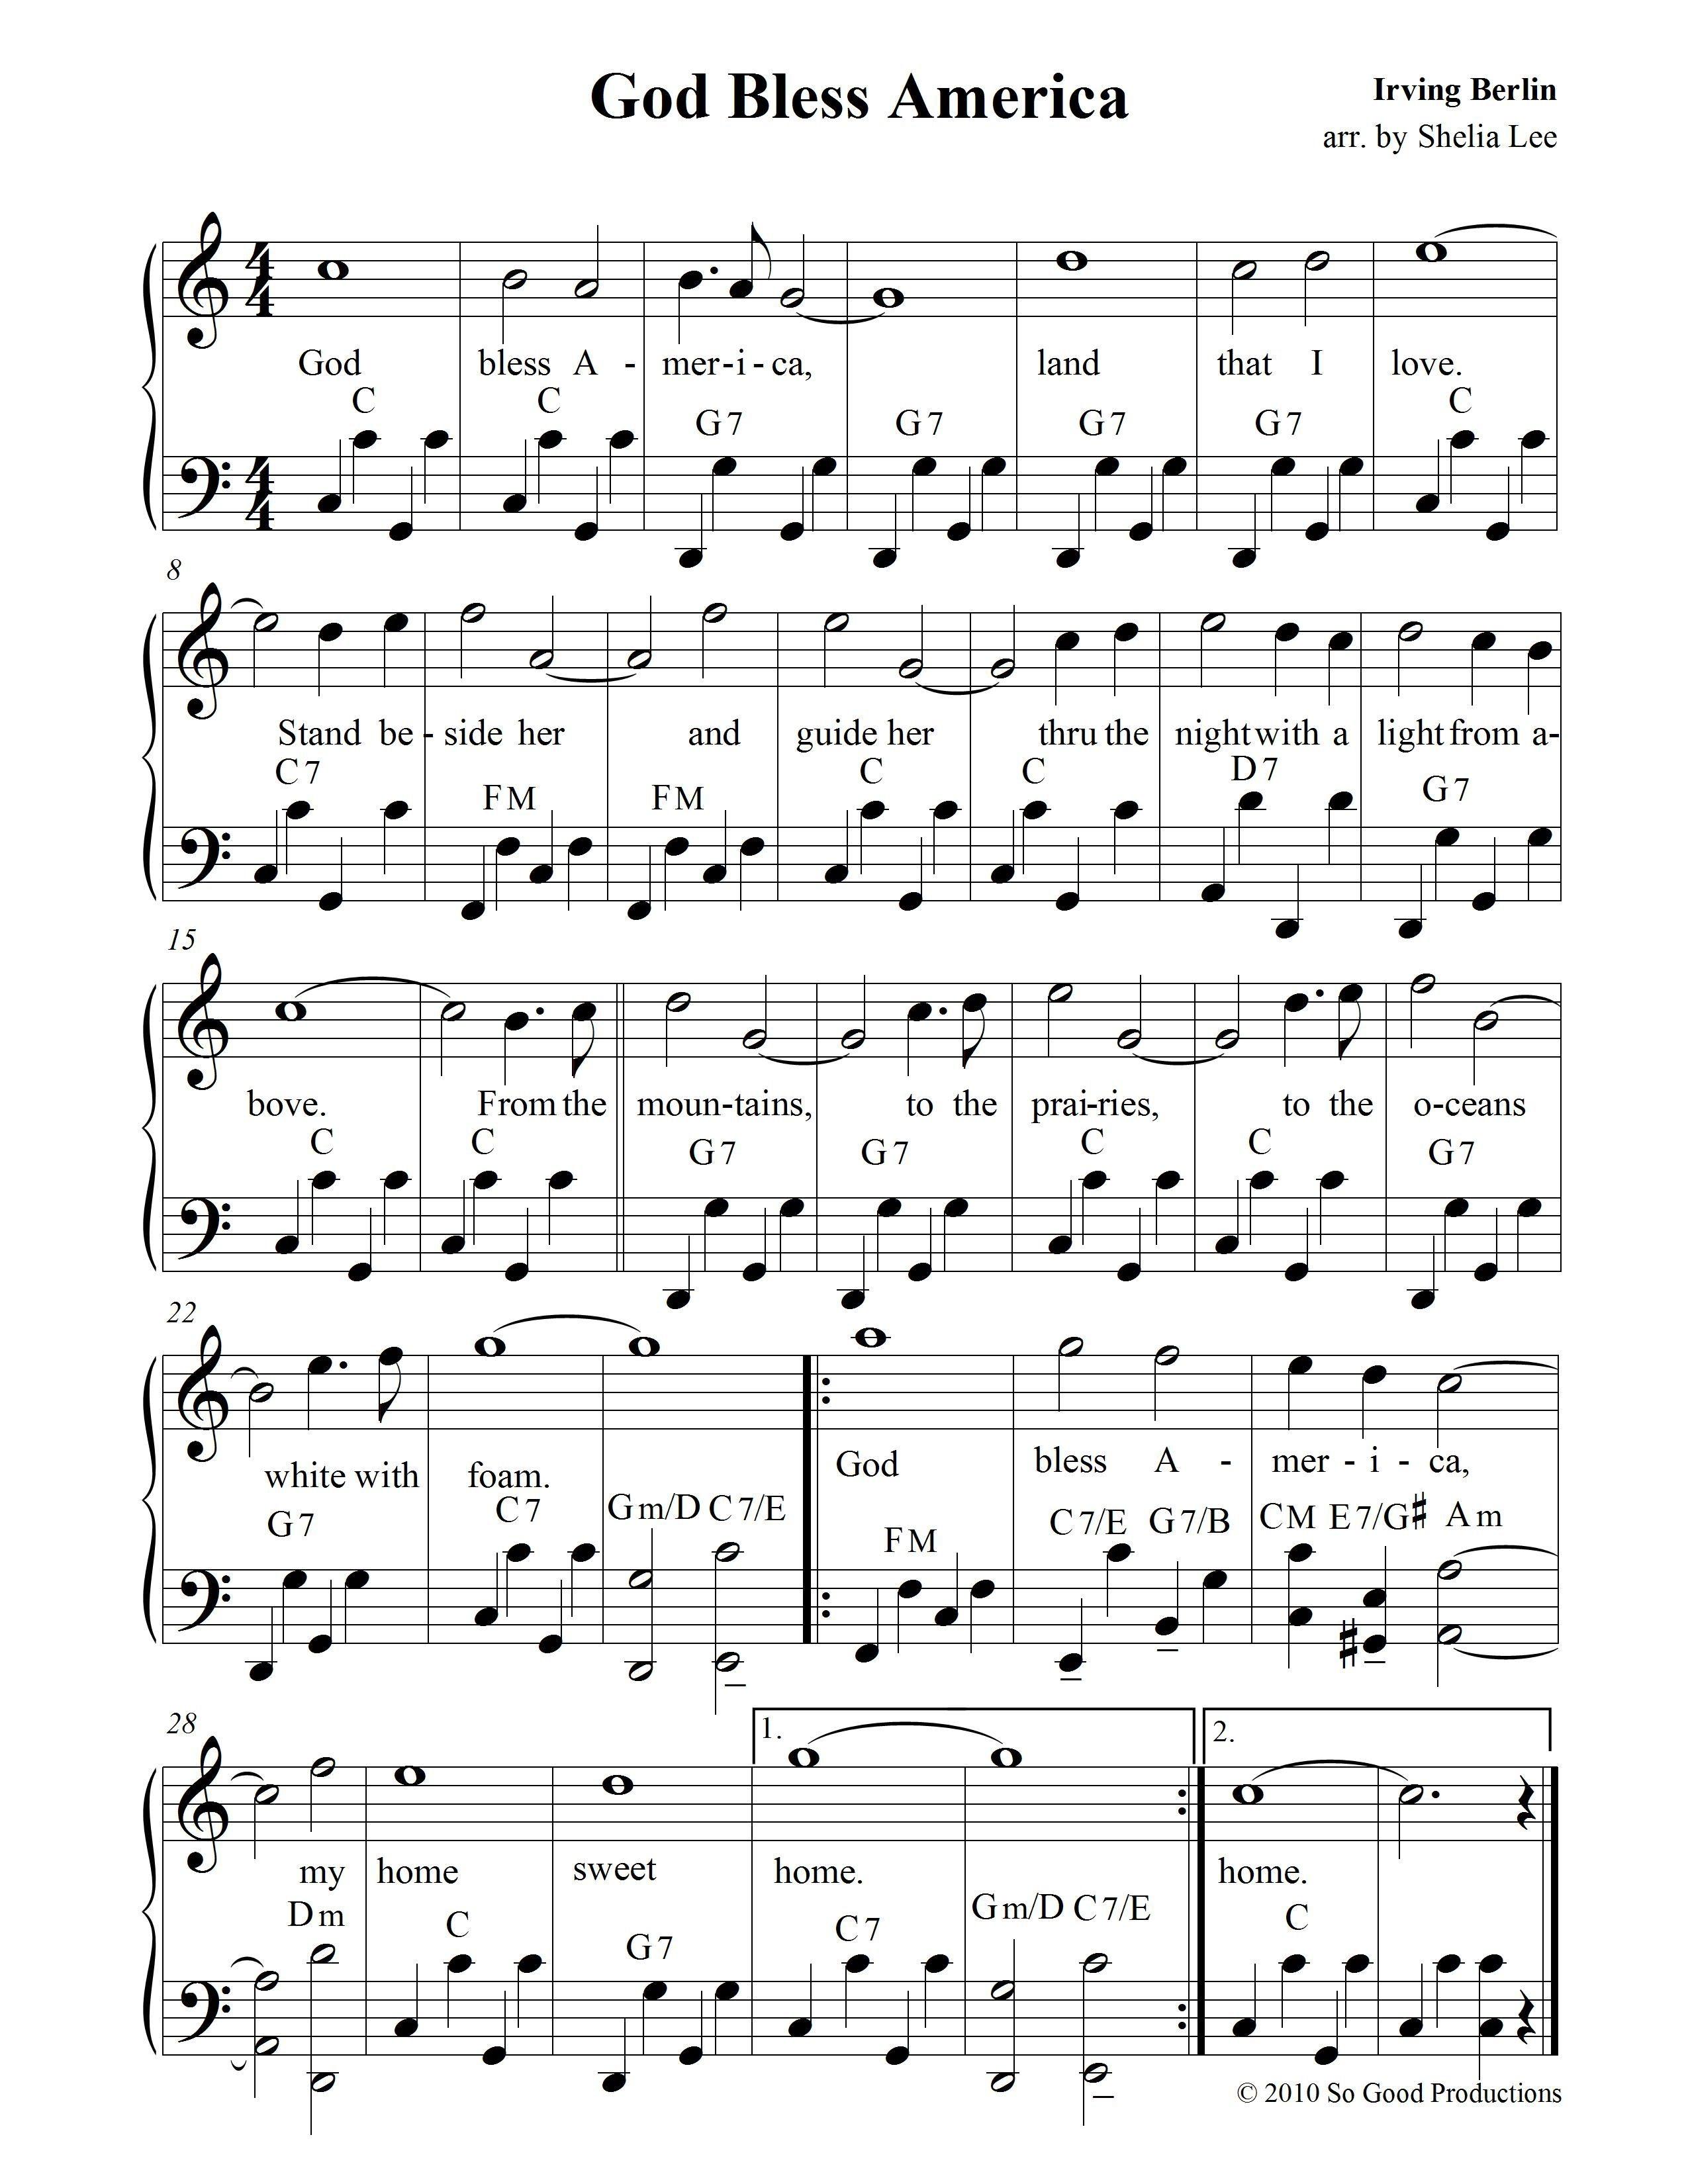 God Bless America Sheet Music Free Pdf - Google Search | Patriotic - Free Printable Gospel Sheet Music For Piano